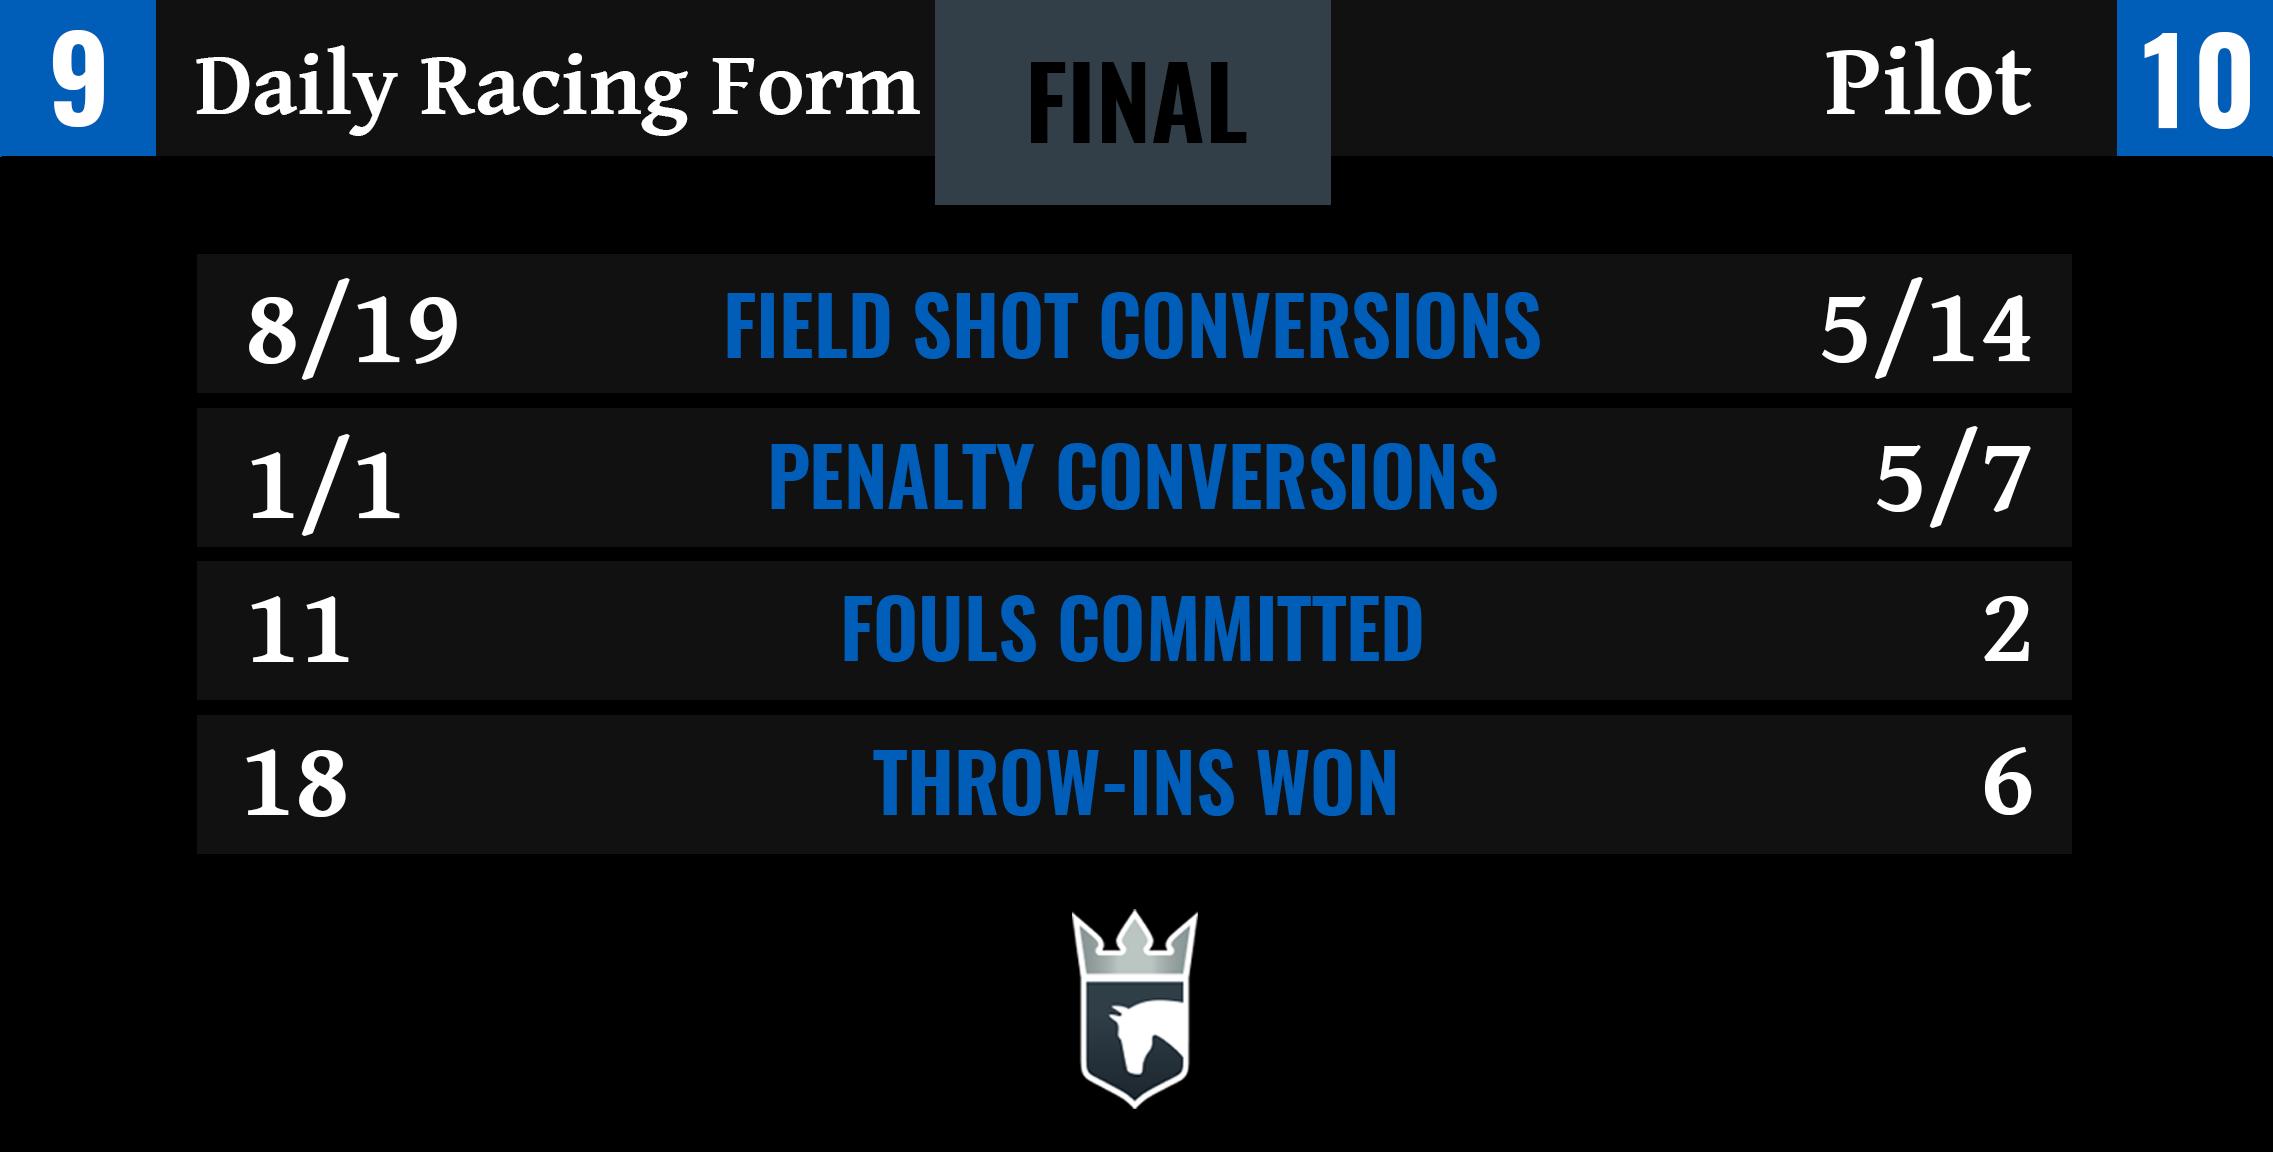 Daily Racing Form vs Pilot Final Stats